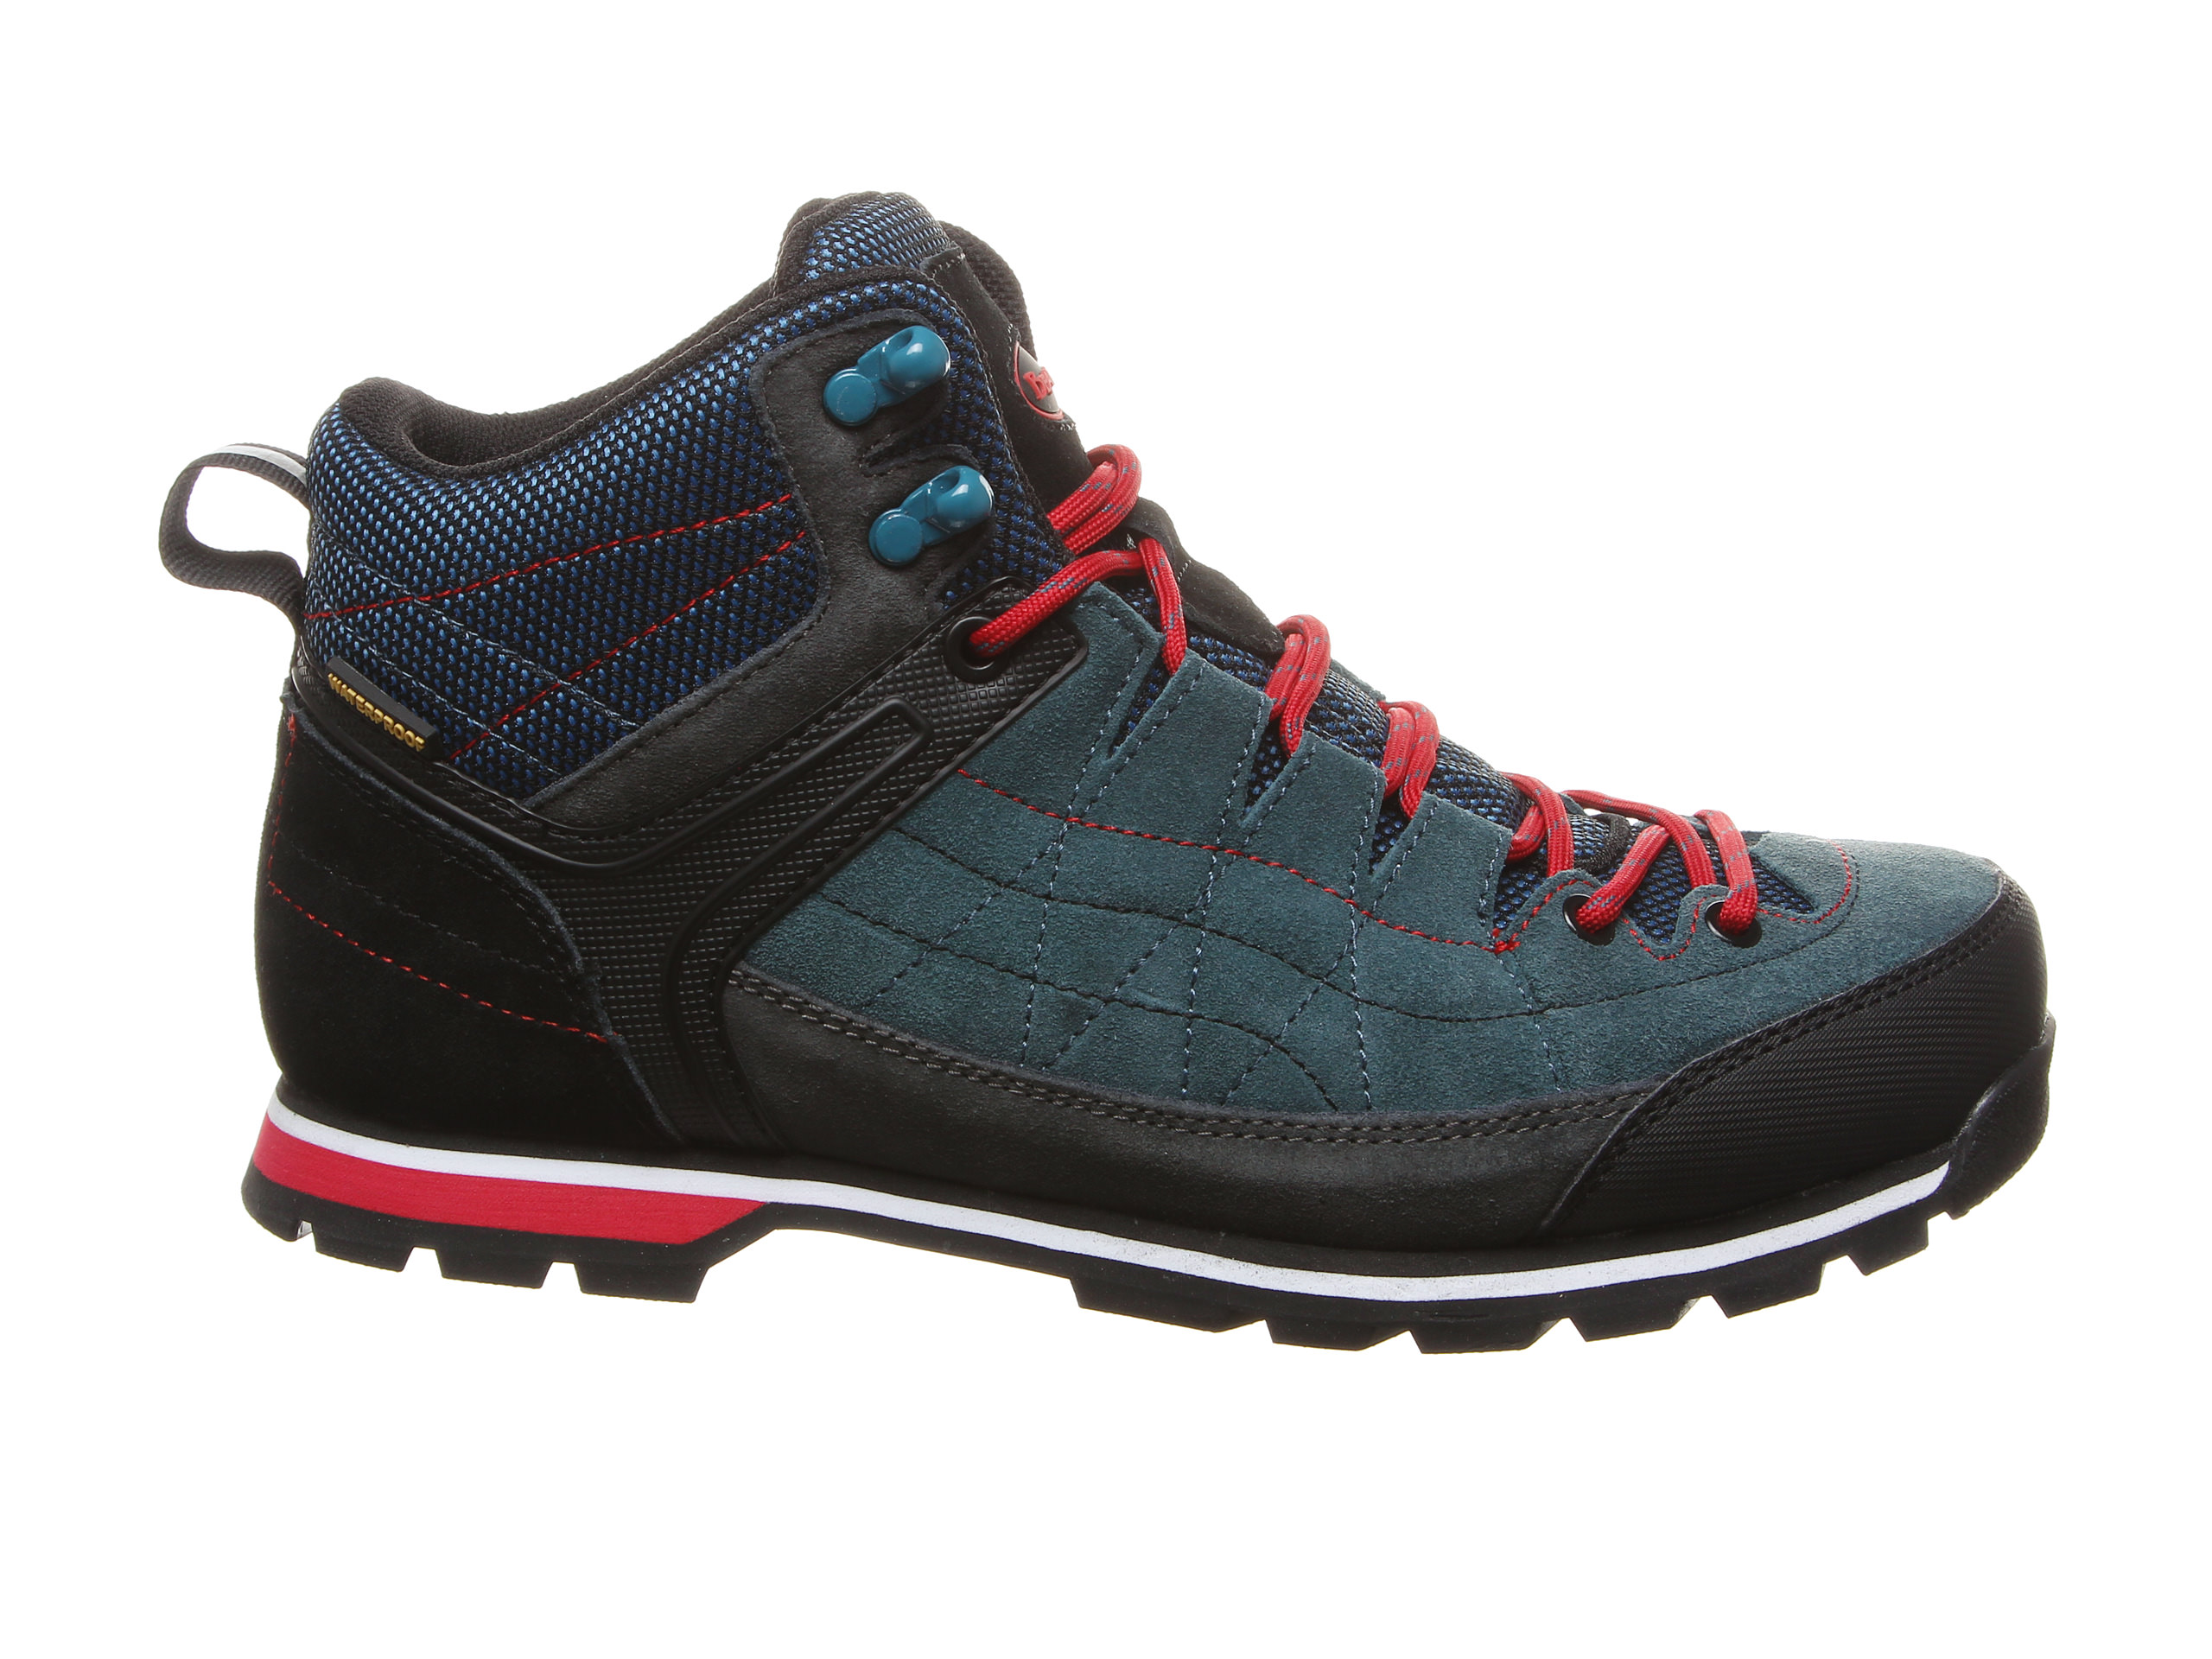 Bearpaw Yosemite Men's Boots (Blue)